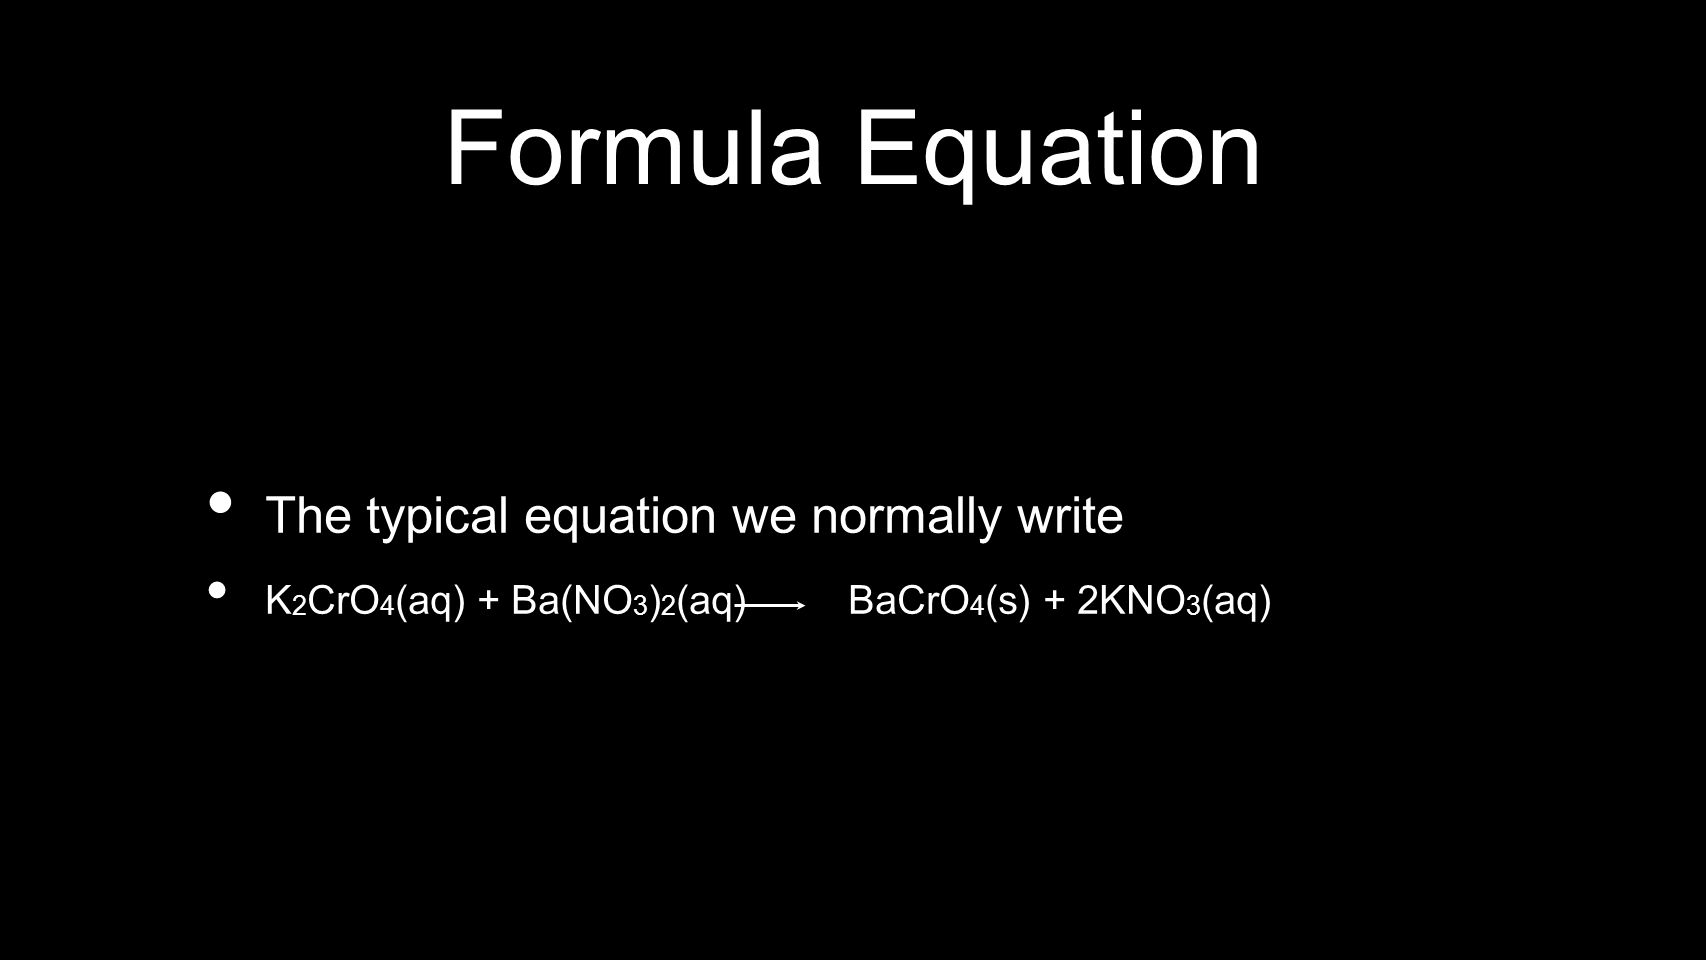 Formula Equation The typical equation we normally write K 2 CrO 4 (aq) + Ba(NO 3 ) 2 (aq) BaCrO 4 (s) + 2KNO 3 (aq)